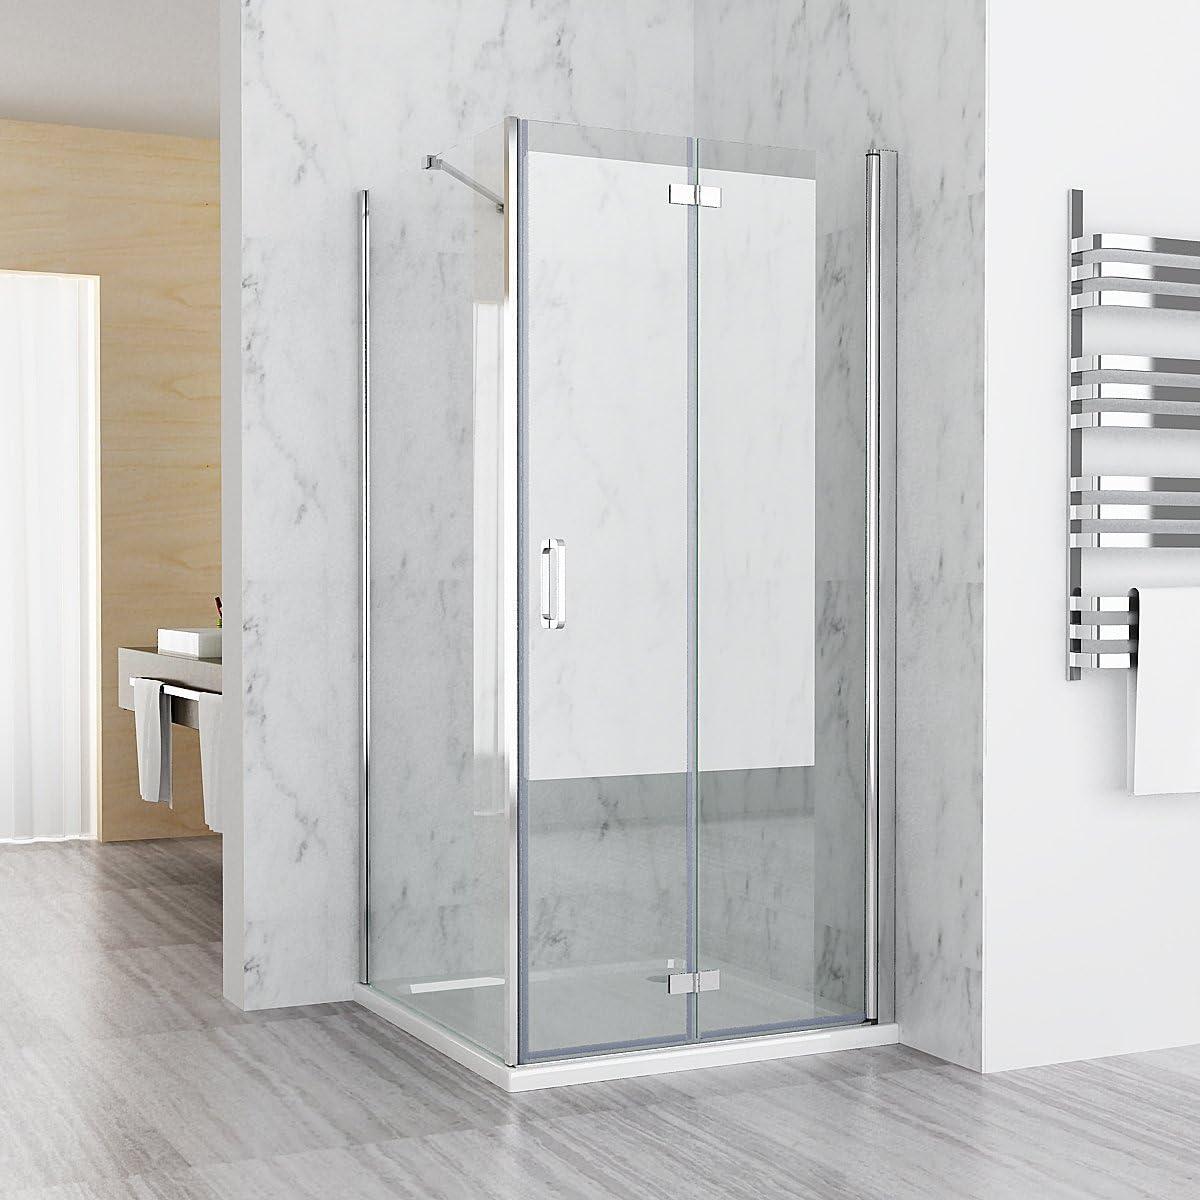 Cabina de ducha 75 – 120 cm puerta plegable 70 – 90 cm de la pared ...